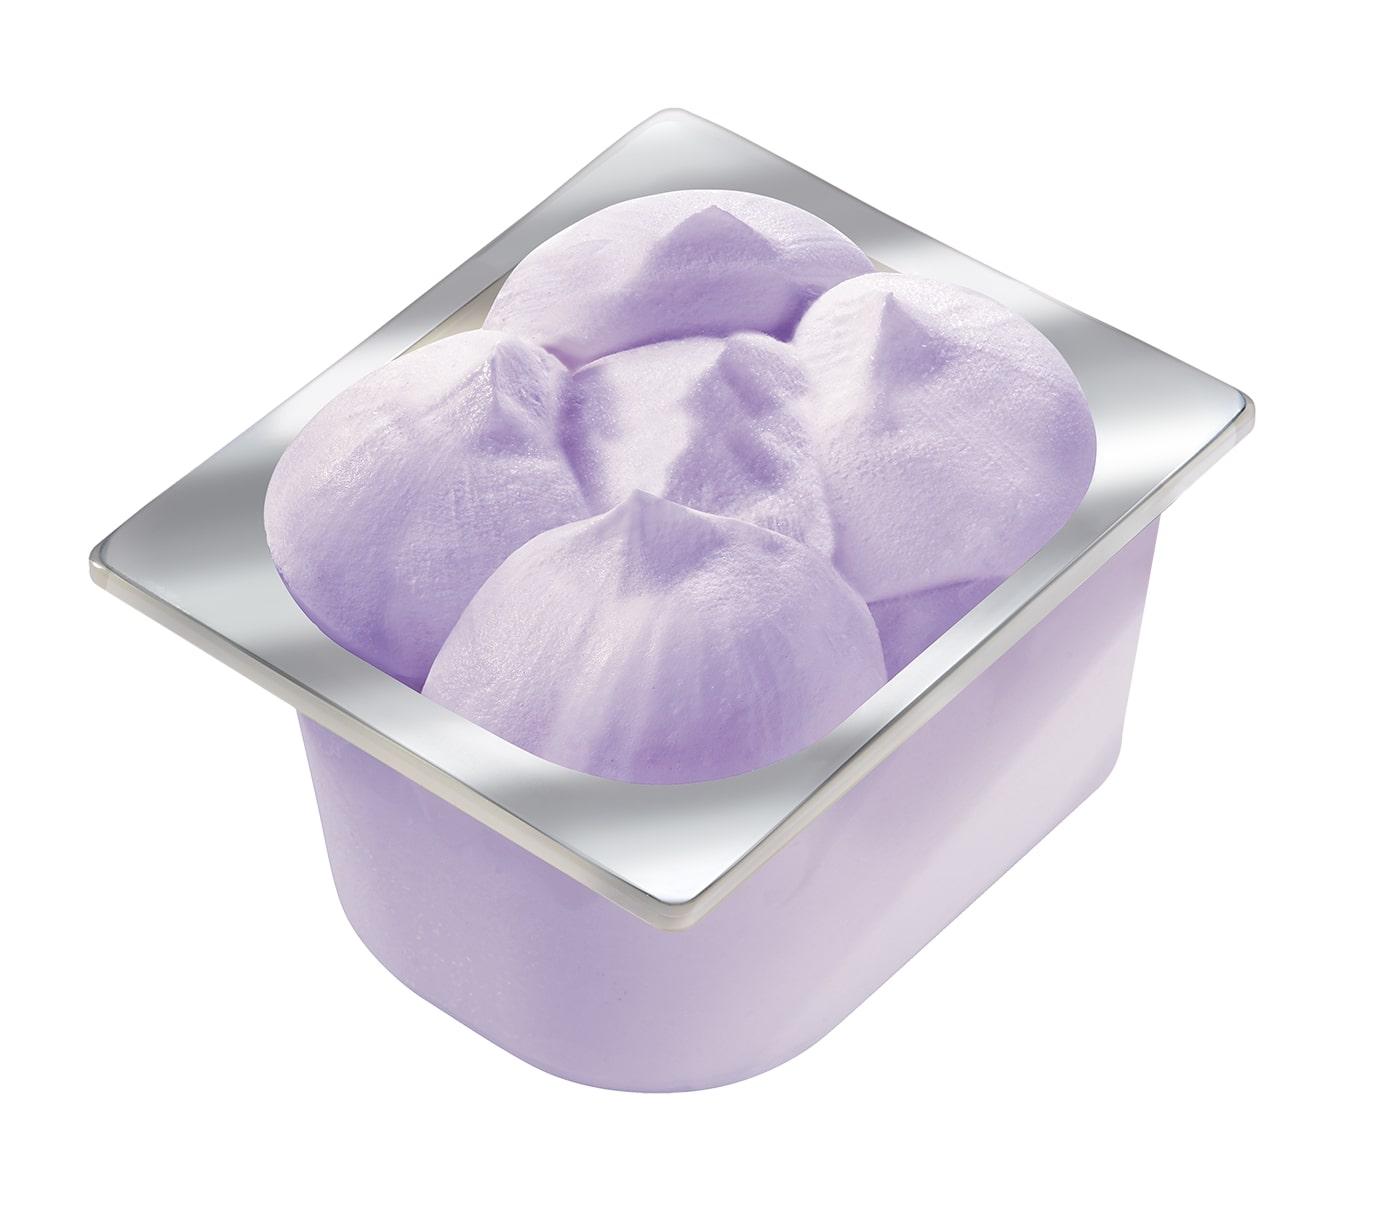 Carte D'Or Мороженое Лаванда (1500 г) - Необычный аромат